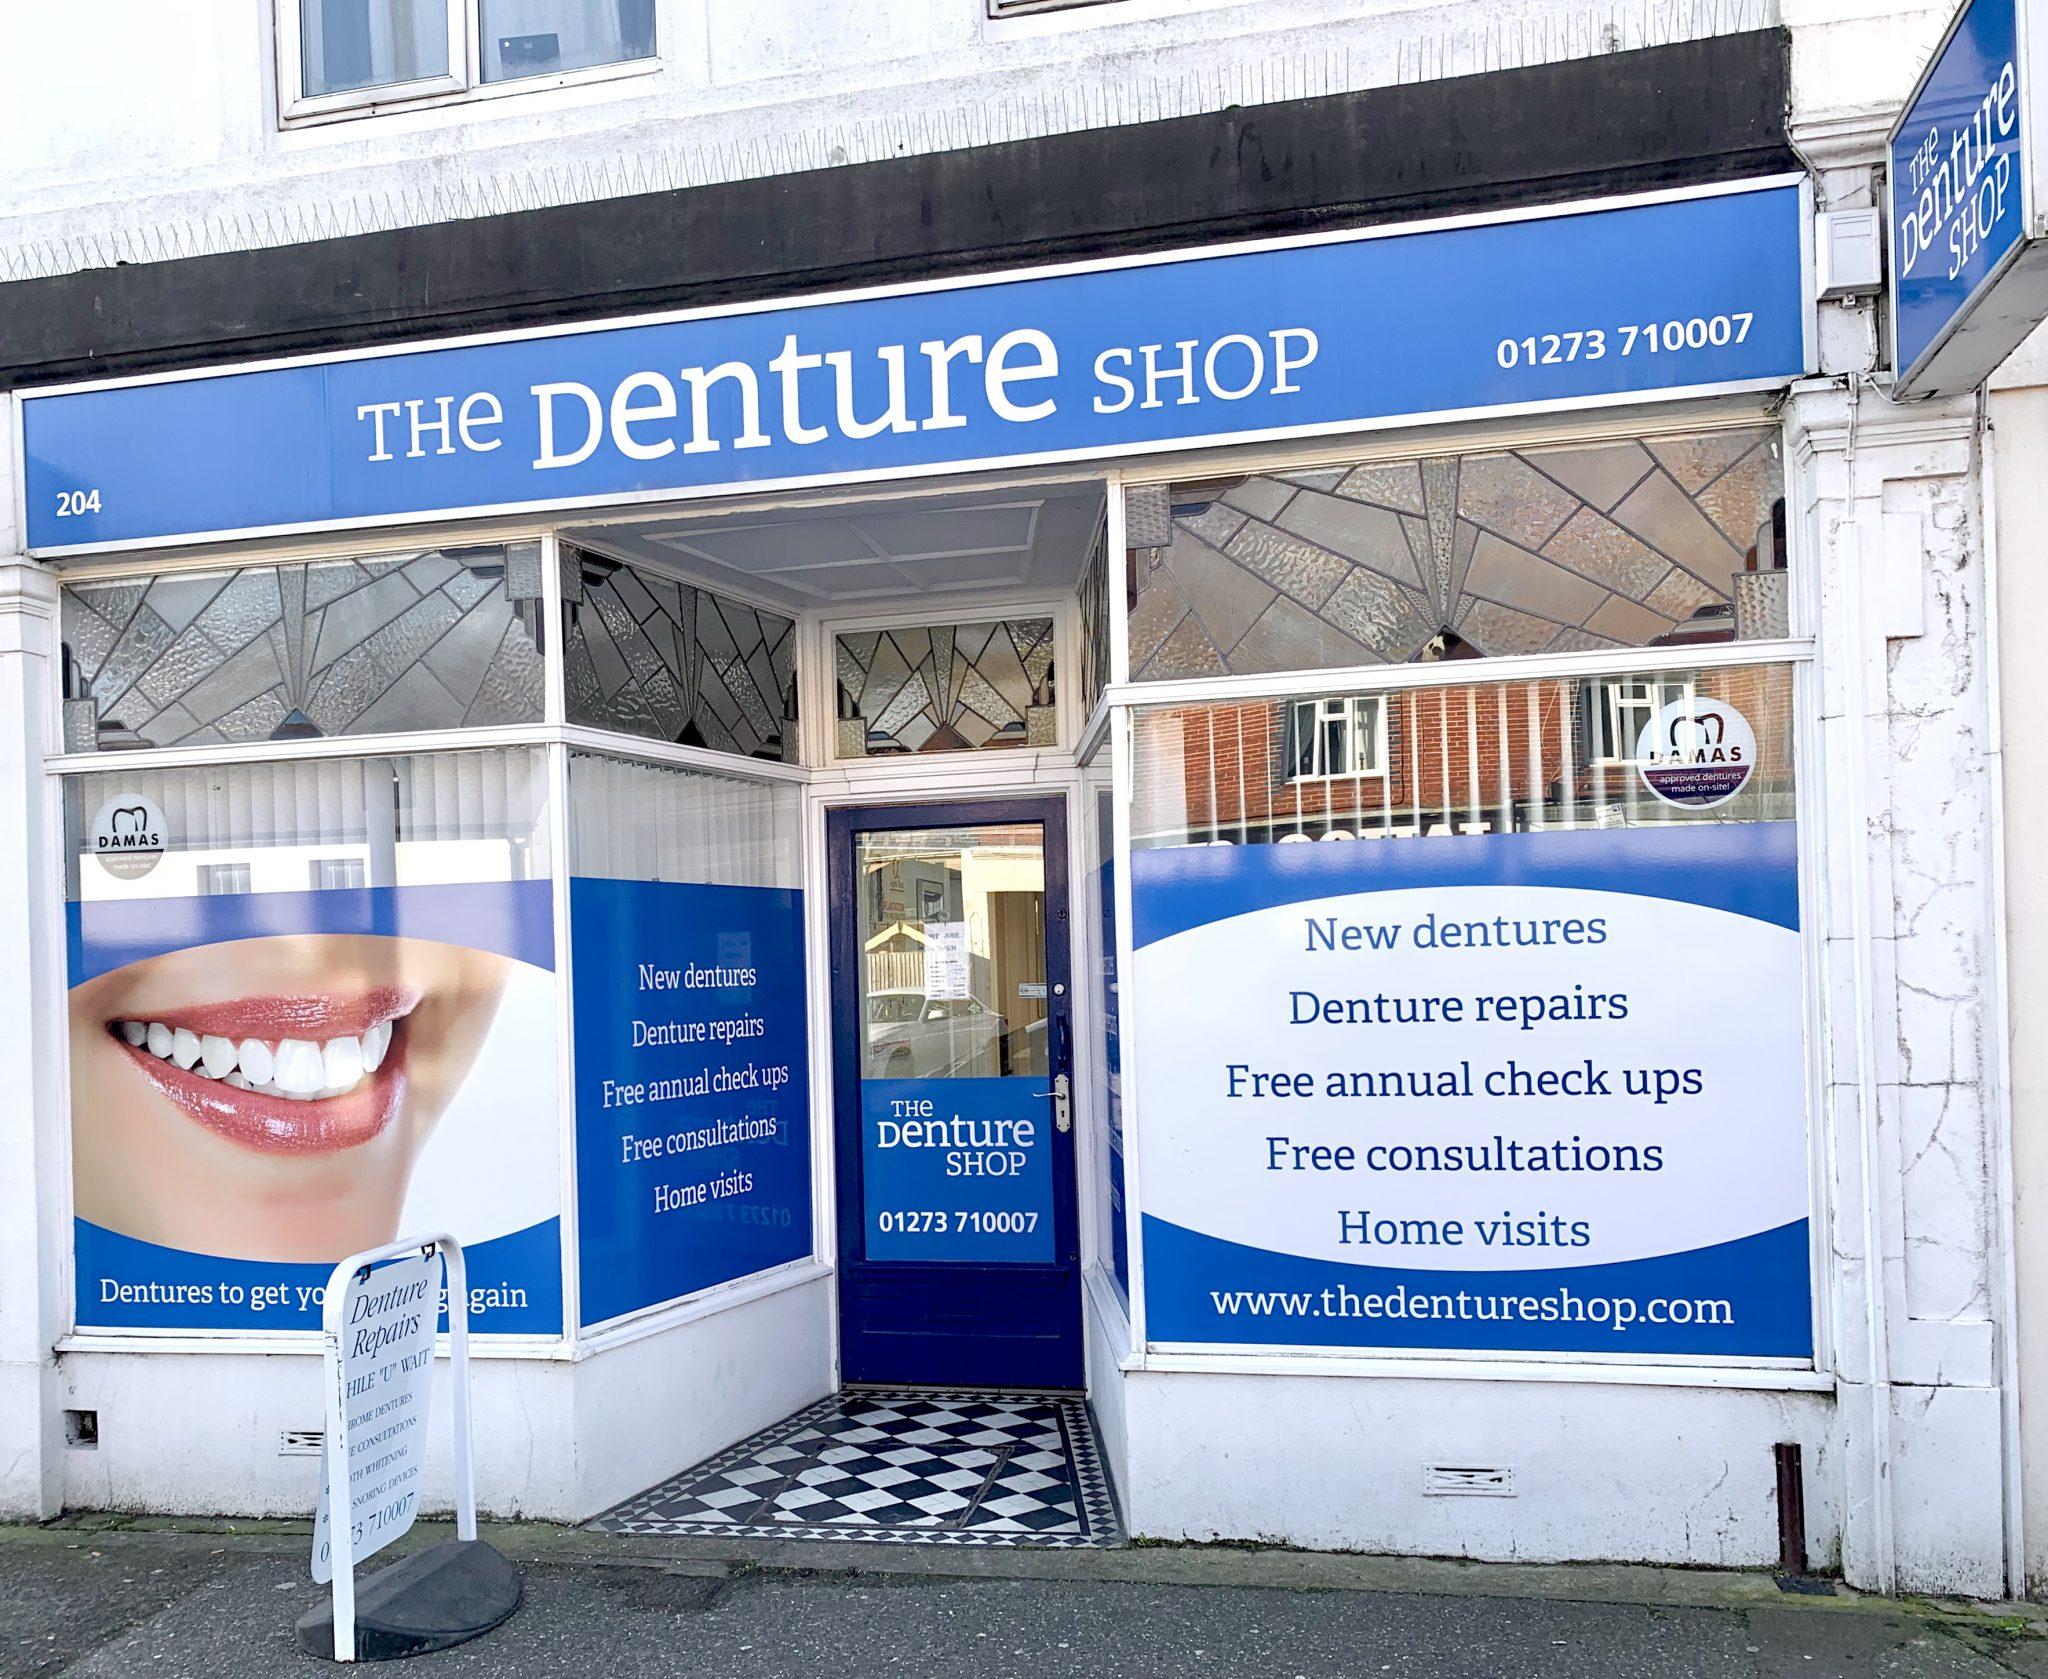 Outside Redhill Denture Shop BN3 5QN